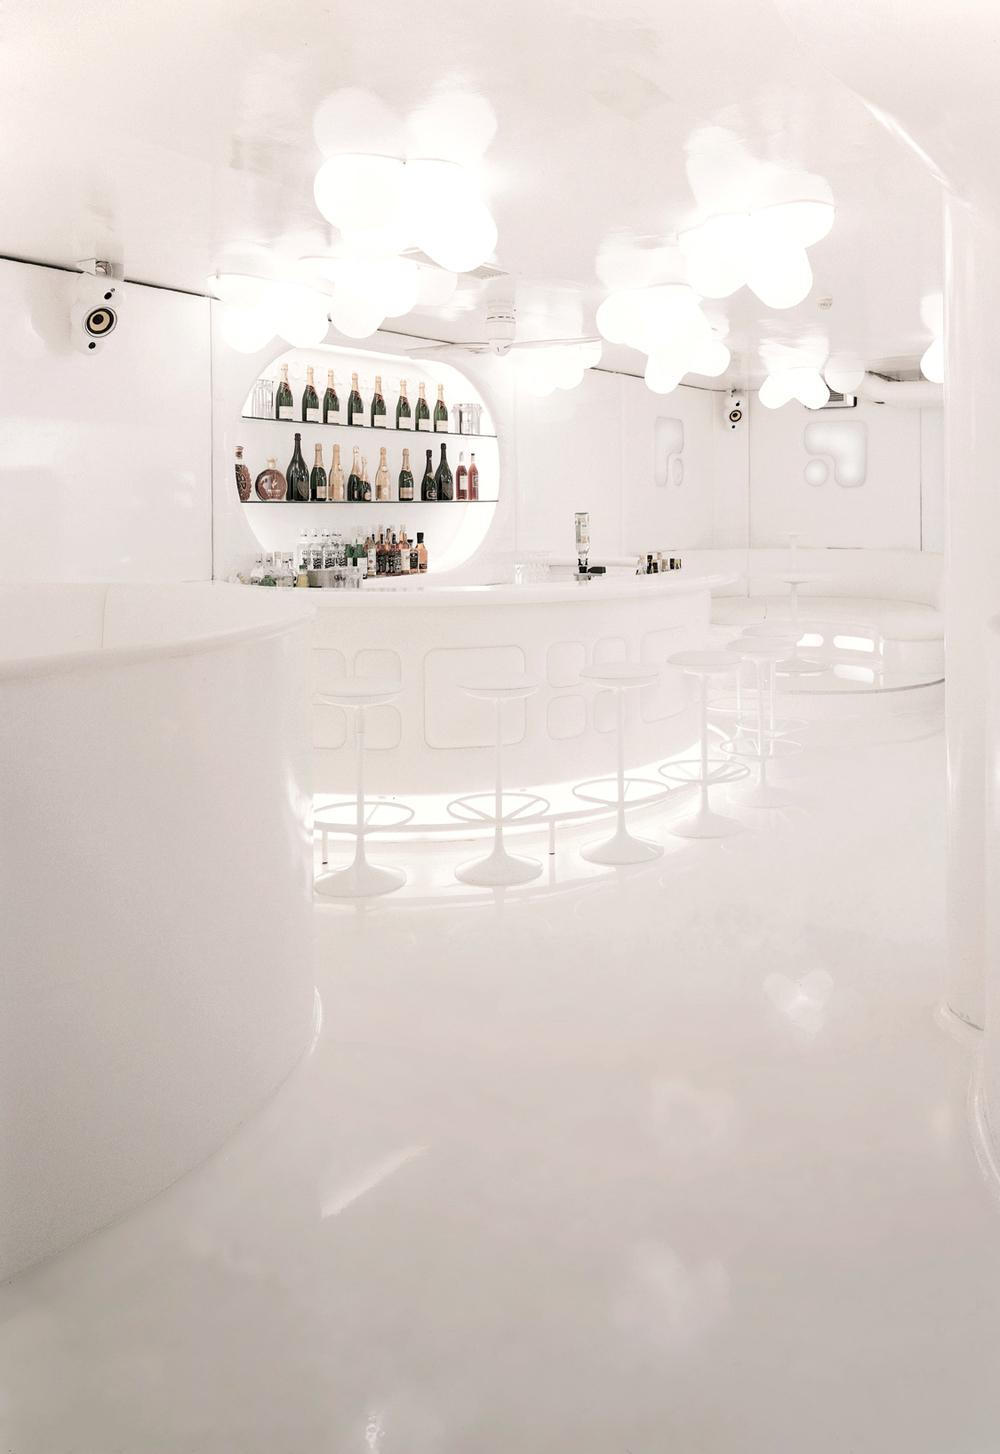 Futuristic white bar stools of NASA Nightclub illuminated by white lights